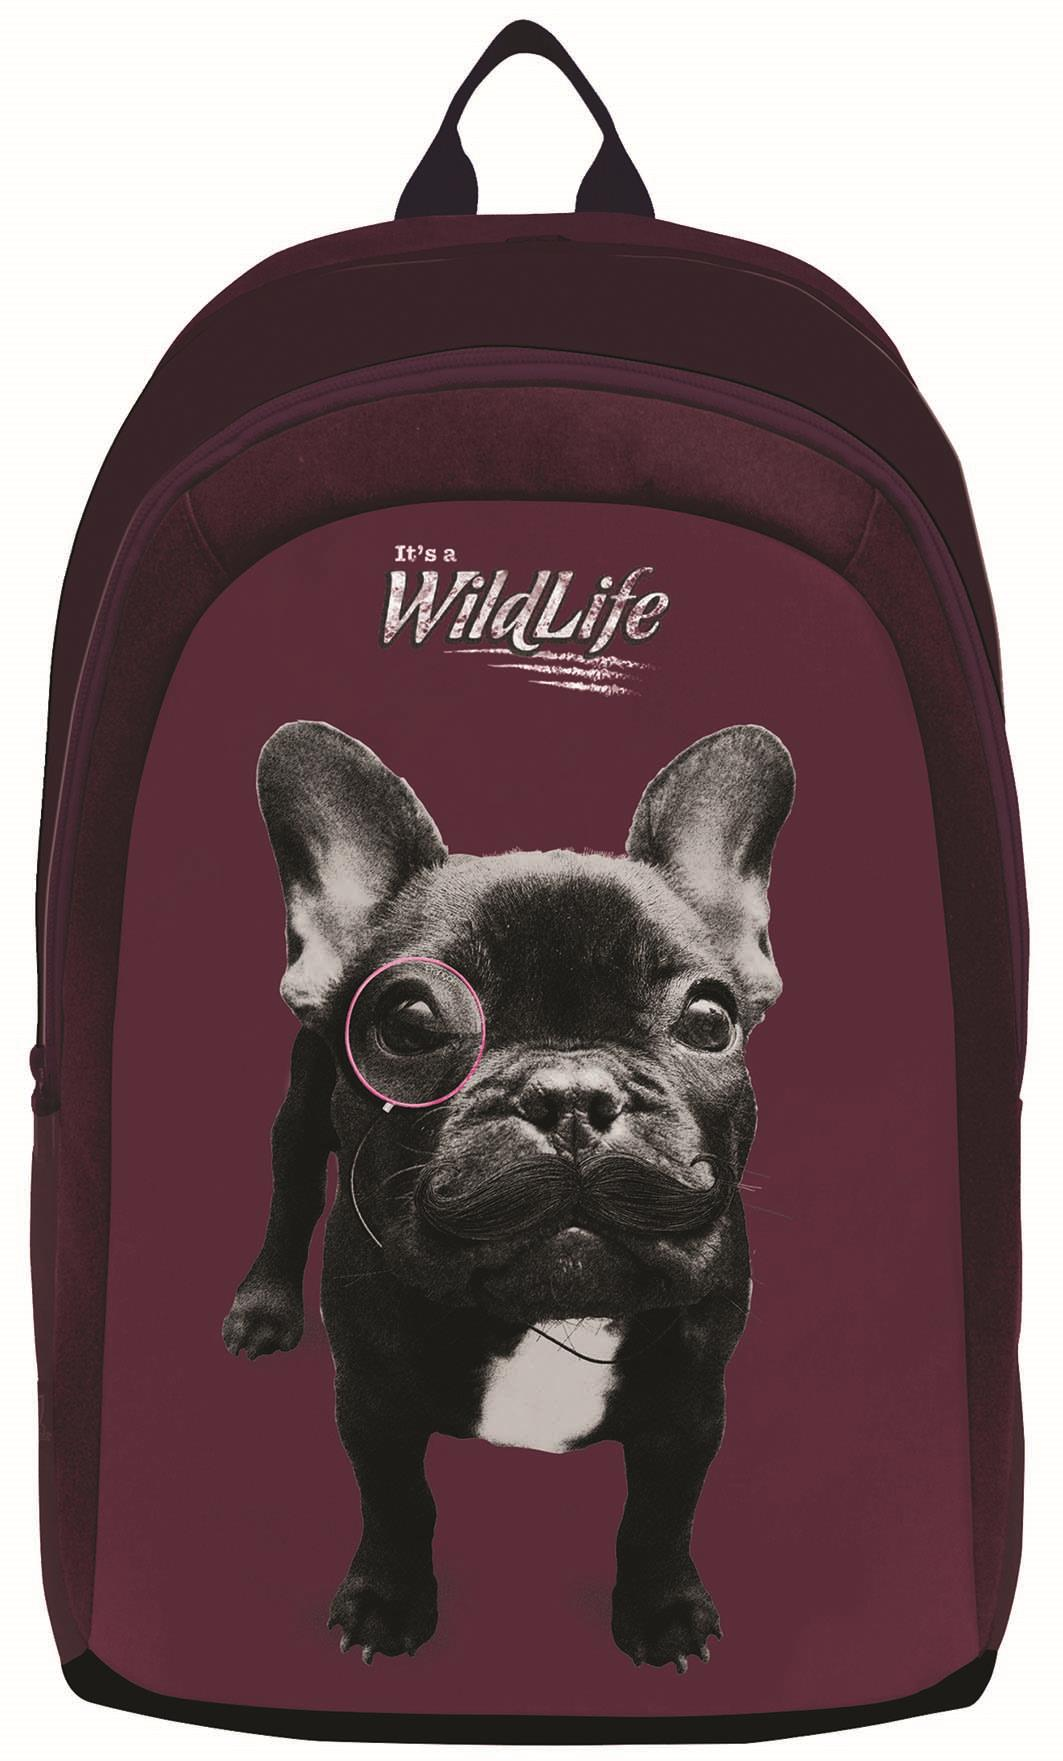 Bagtrotter - Bagtrotter τσάντα δημοτικού σκύλος με 2 θήκες 45x32x16εκ. - - - - 3 σχολικά   τσάντες   δημοτικού